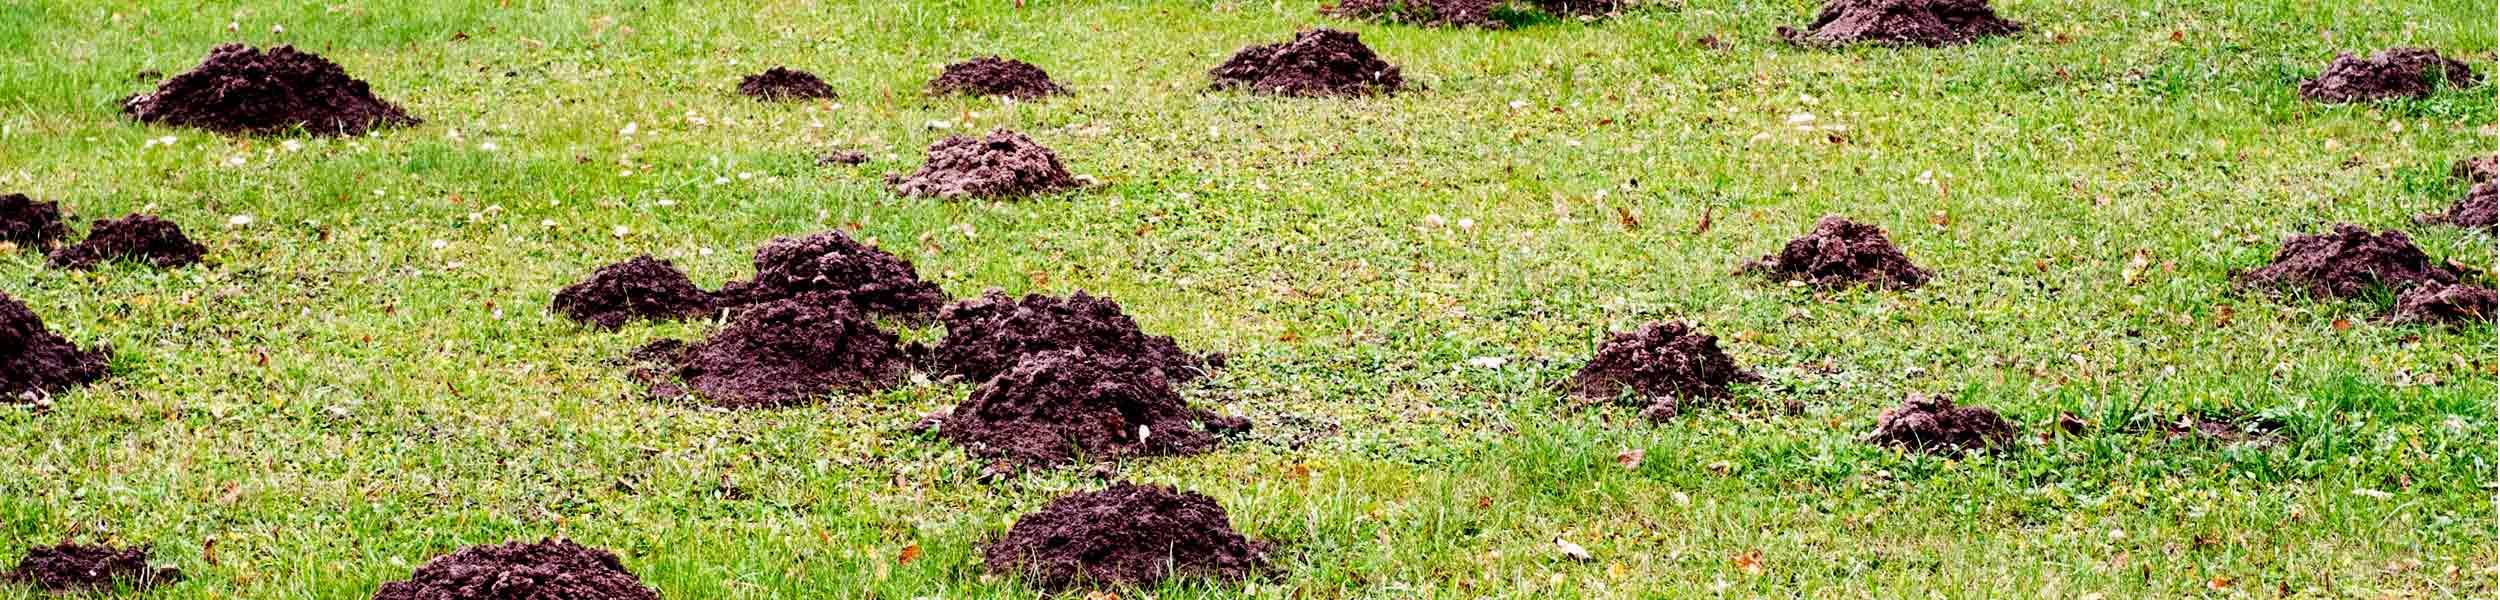 ACE Exterminating-Pest-Services-Moles-Mole-Damaged-Yard-Header